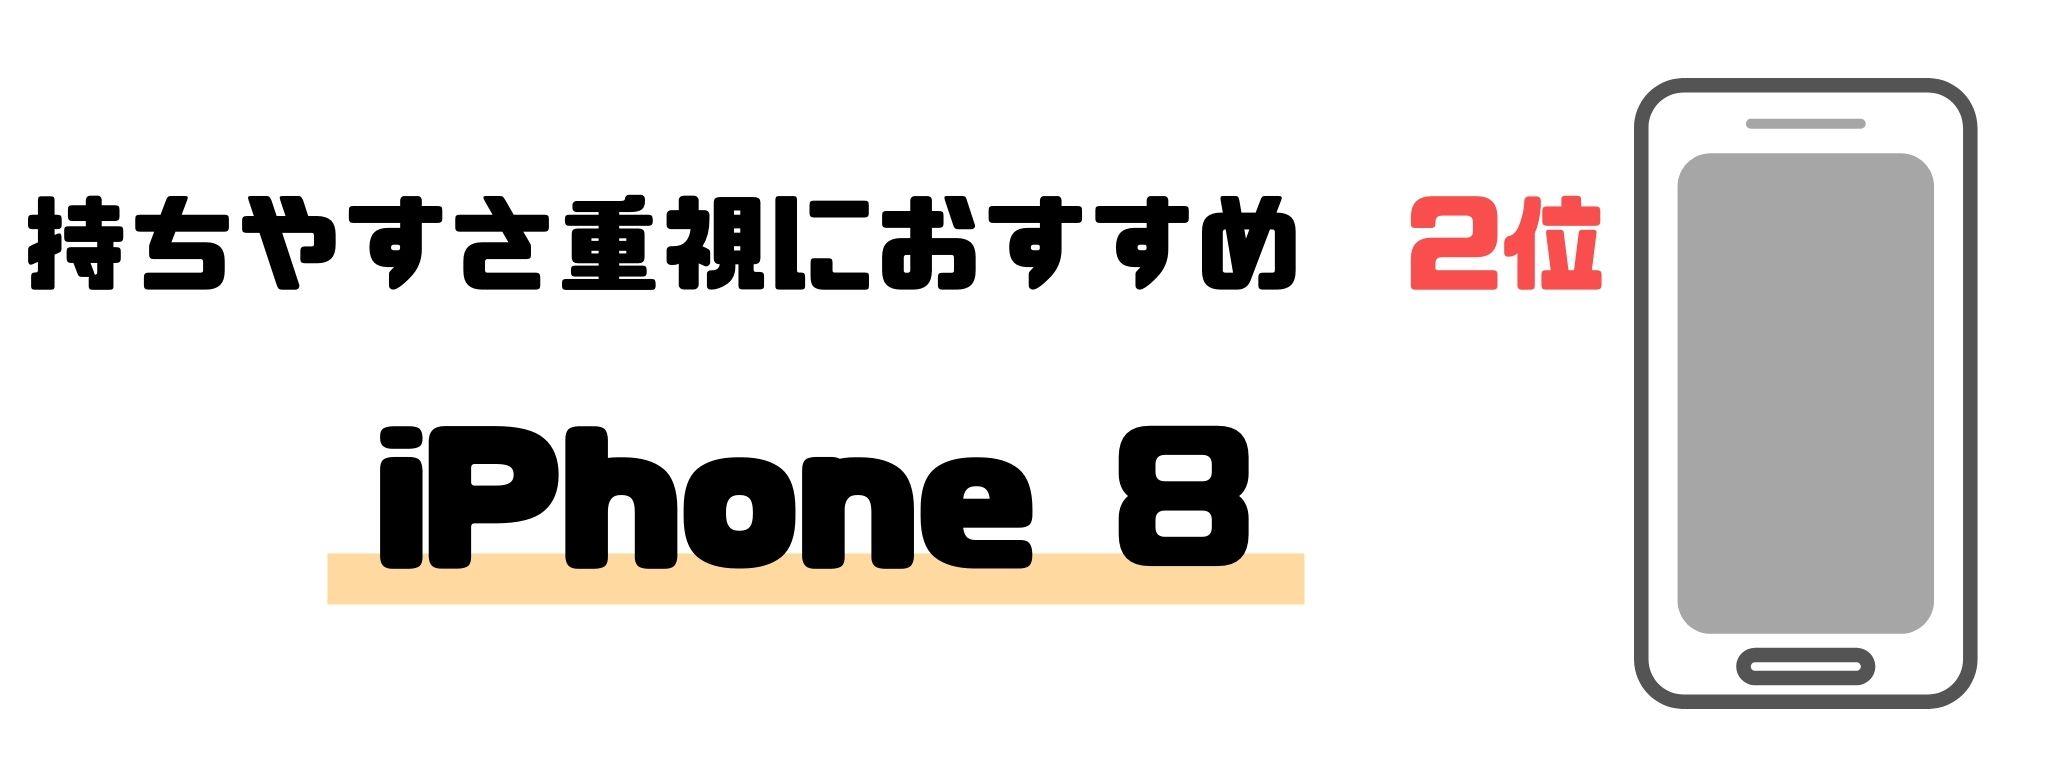 iPhone_おすすめ_持ちやすさ2